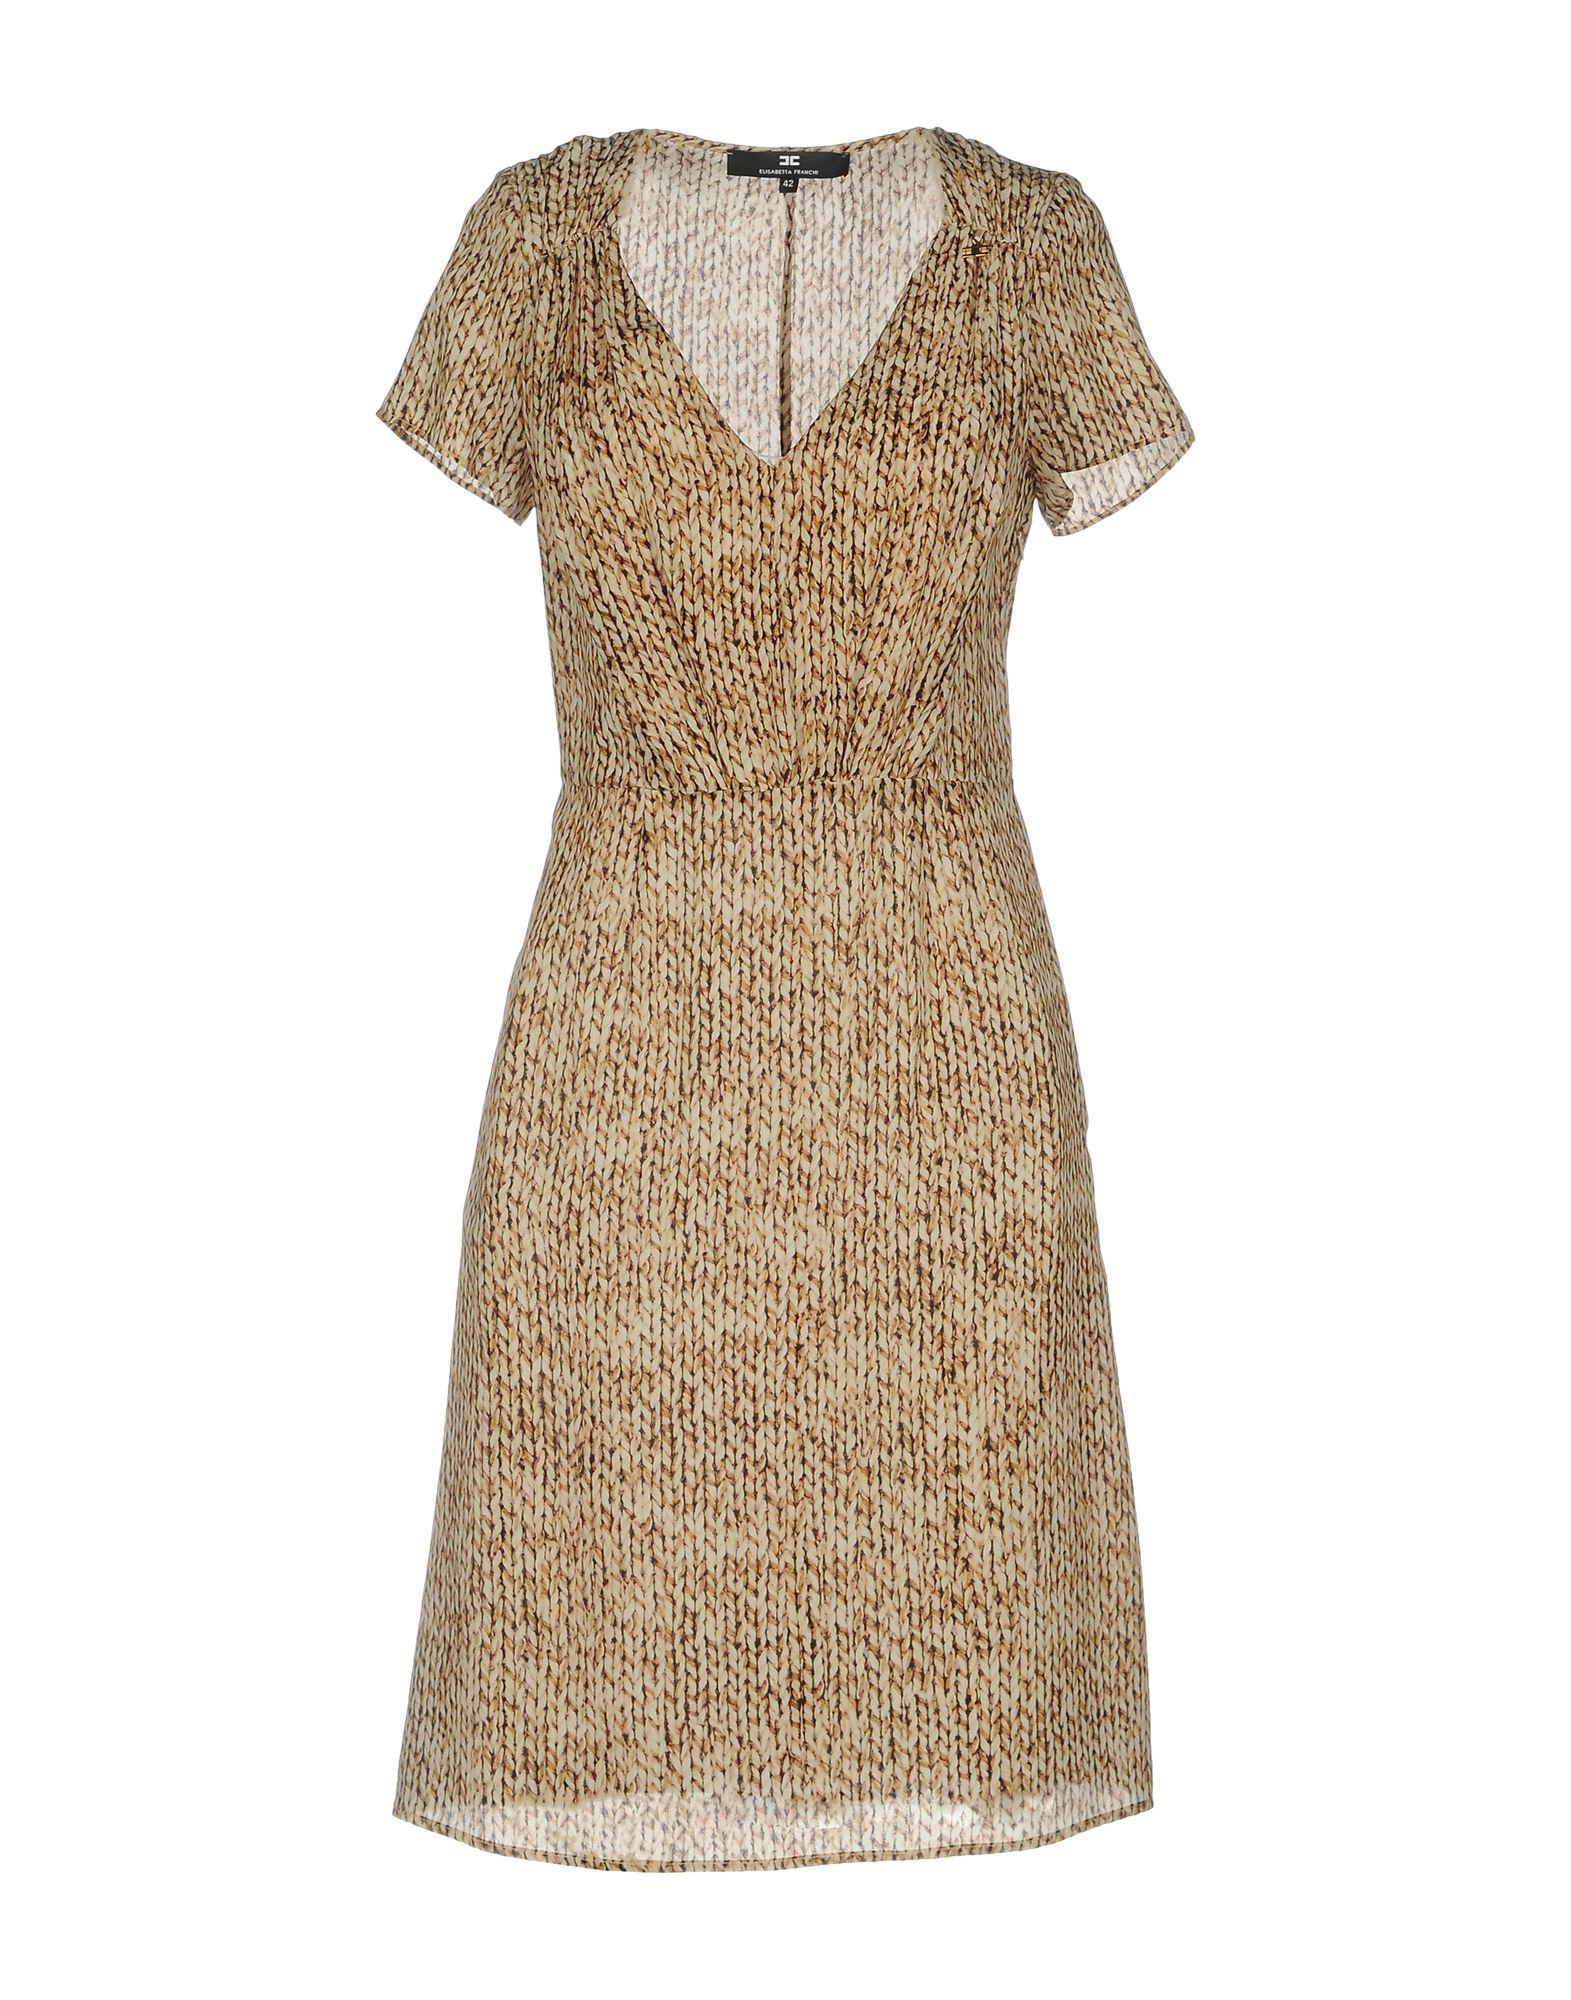 Elisabetta Franchi Sand Print Silk Short Dress